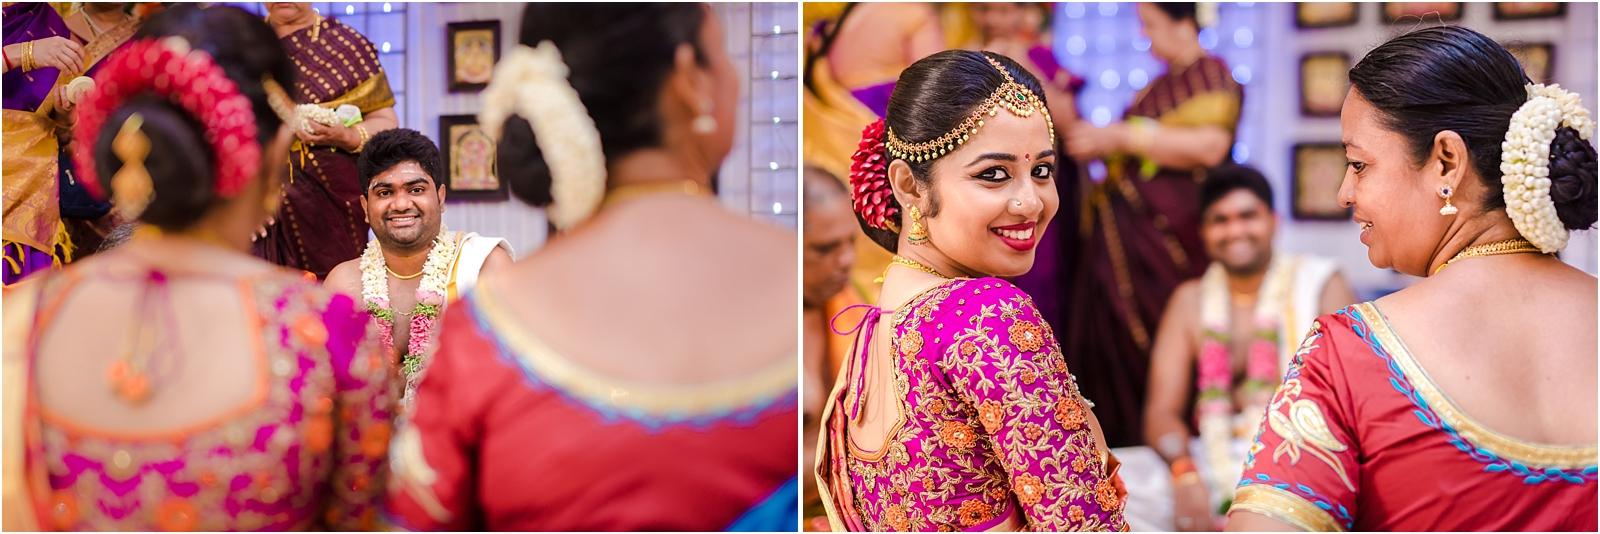 14042017-Achu-Deepthi-Wedding-792.jpg